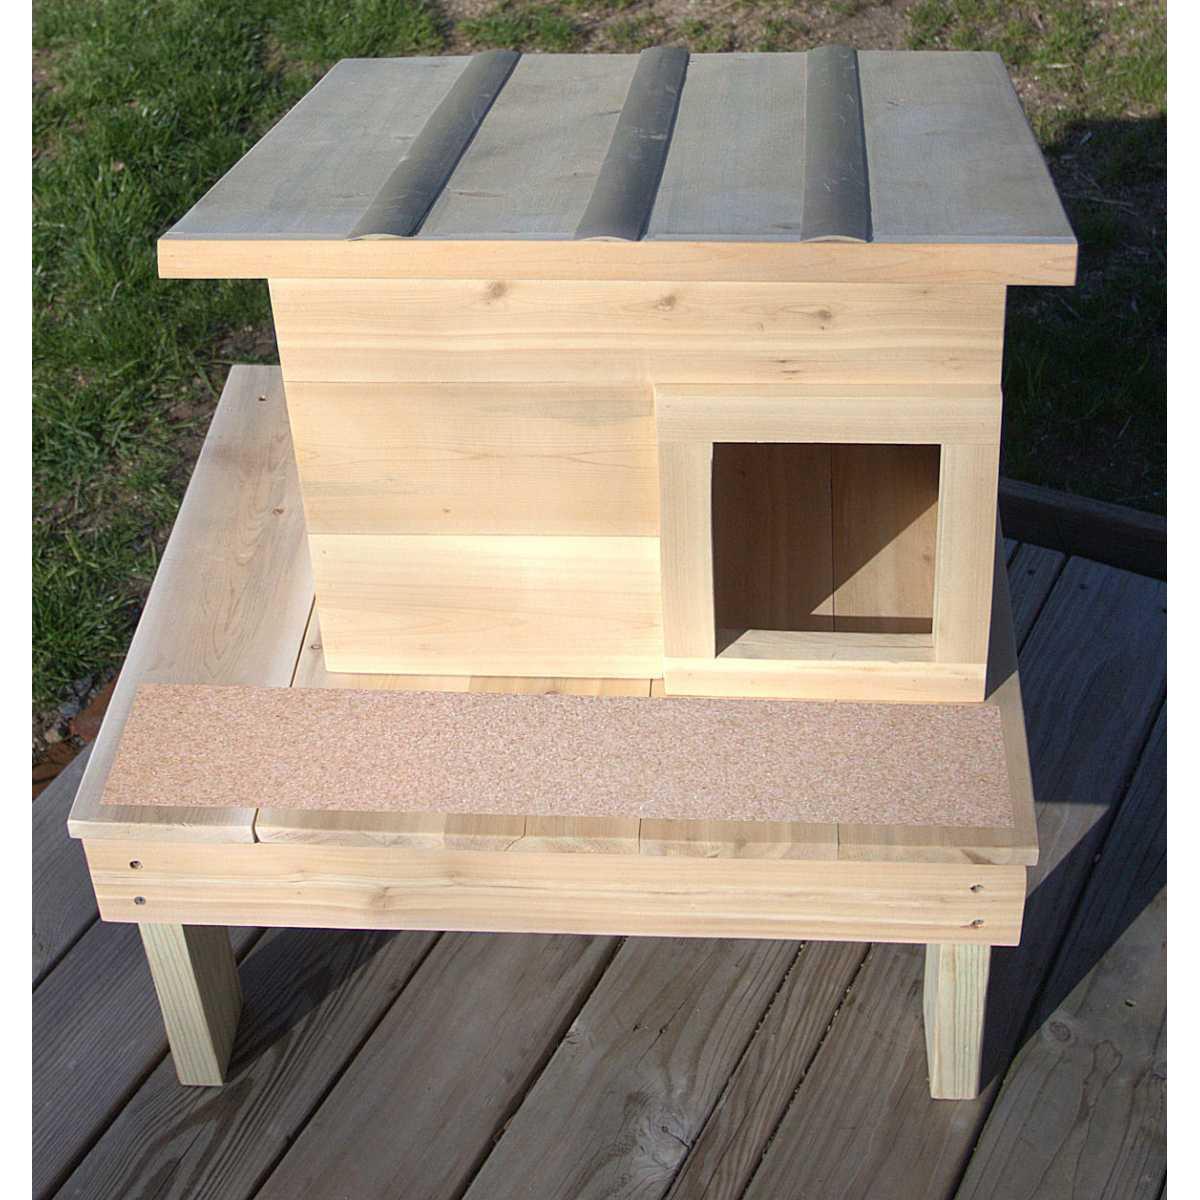 Double Deck Outdoor Cedar Wood Cat House Shelter